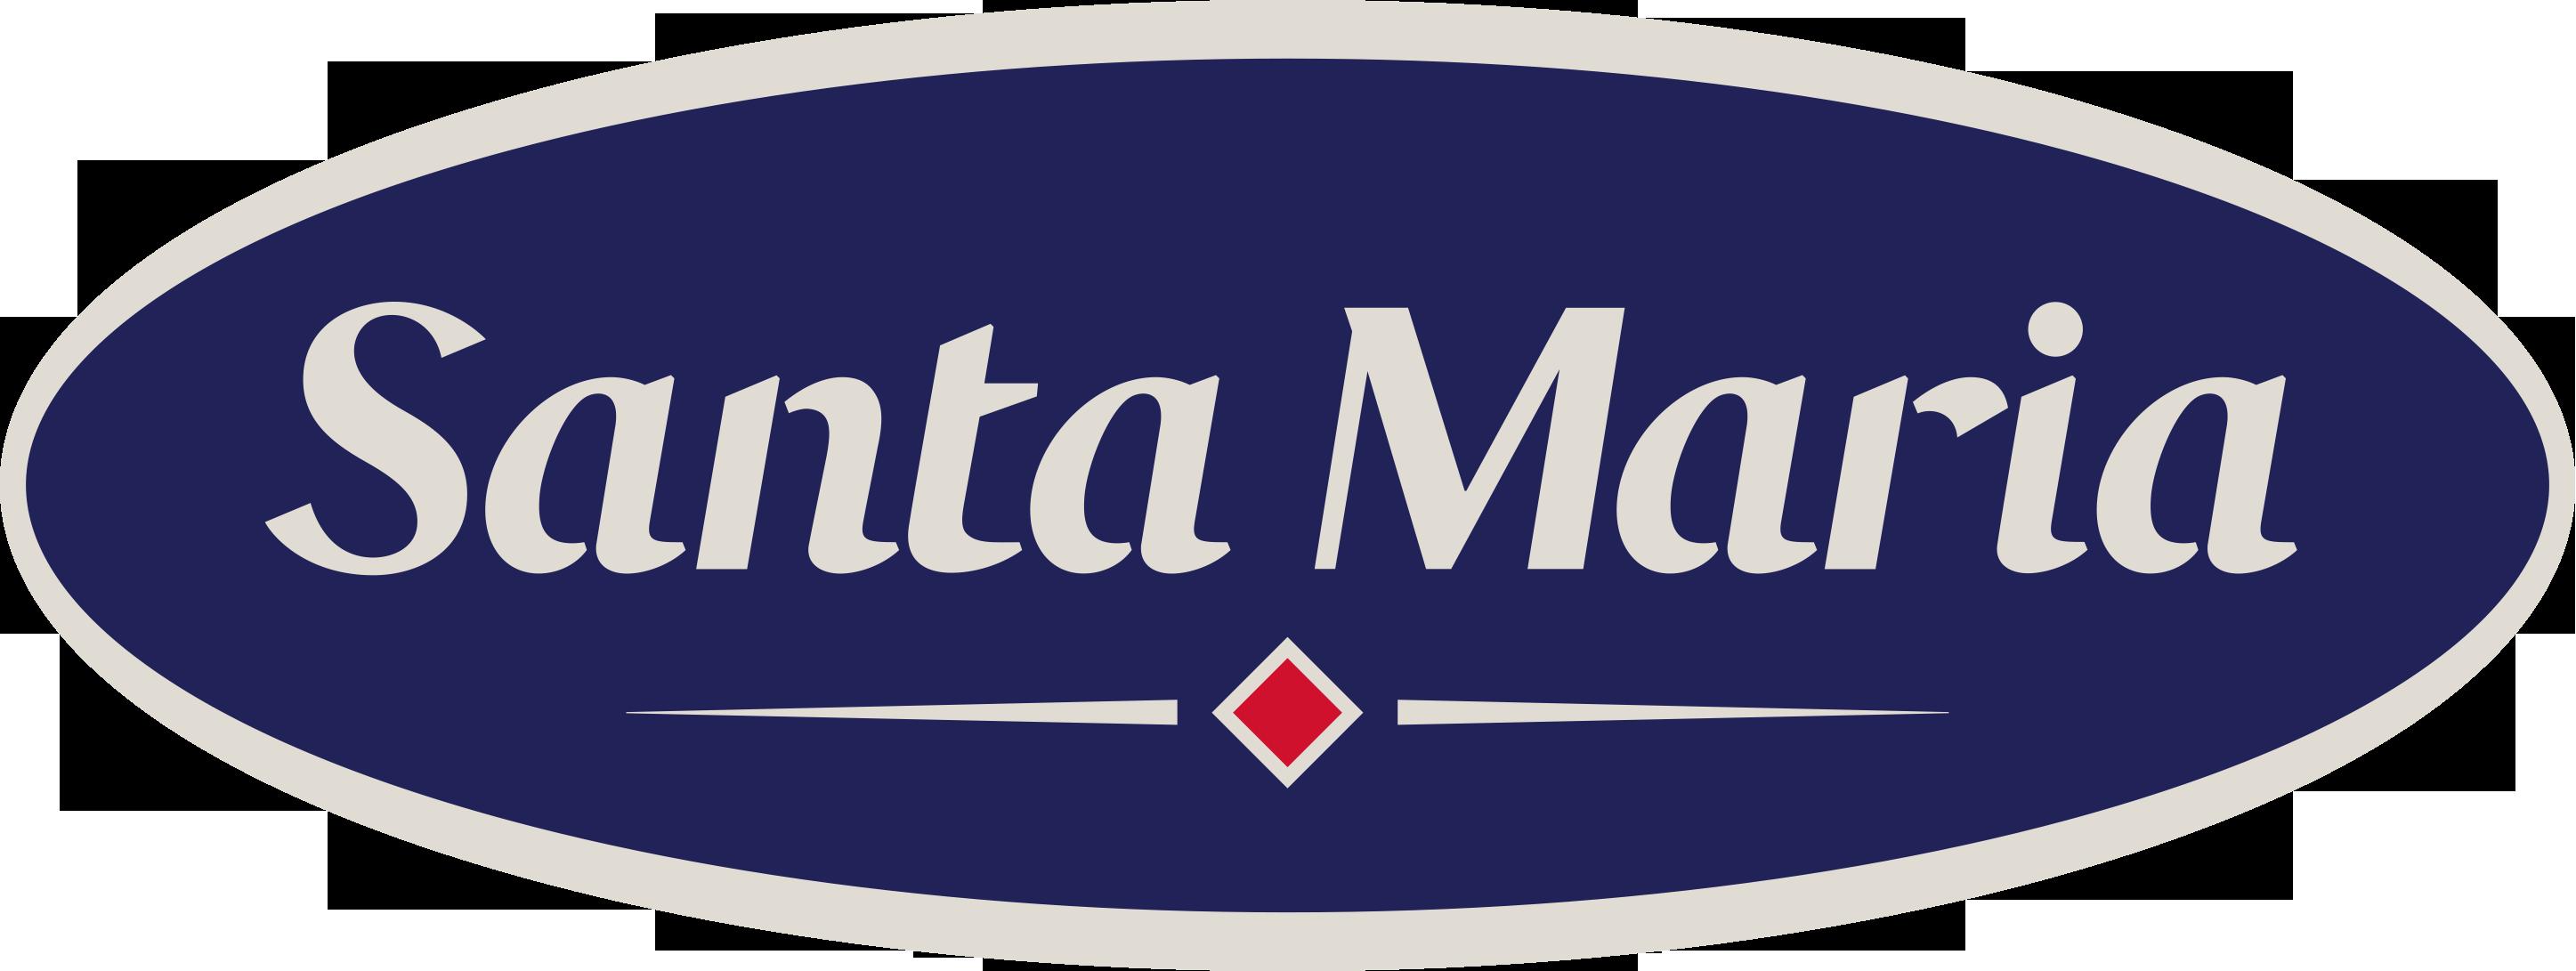 Maresi Santa Maria